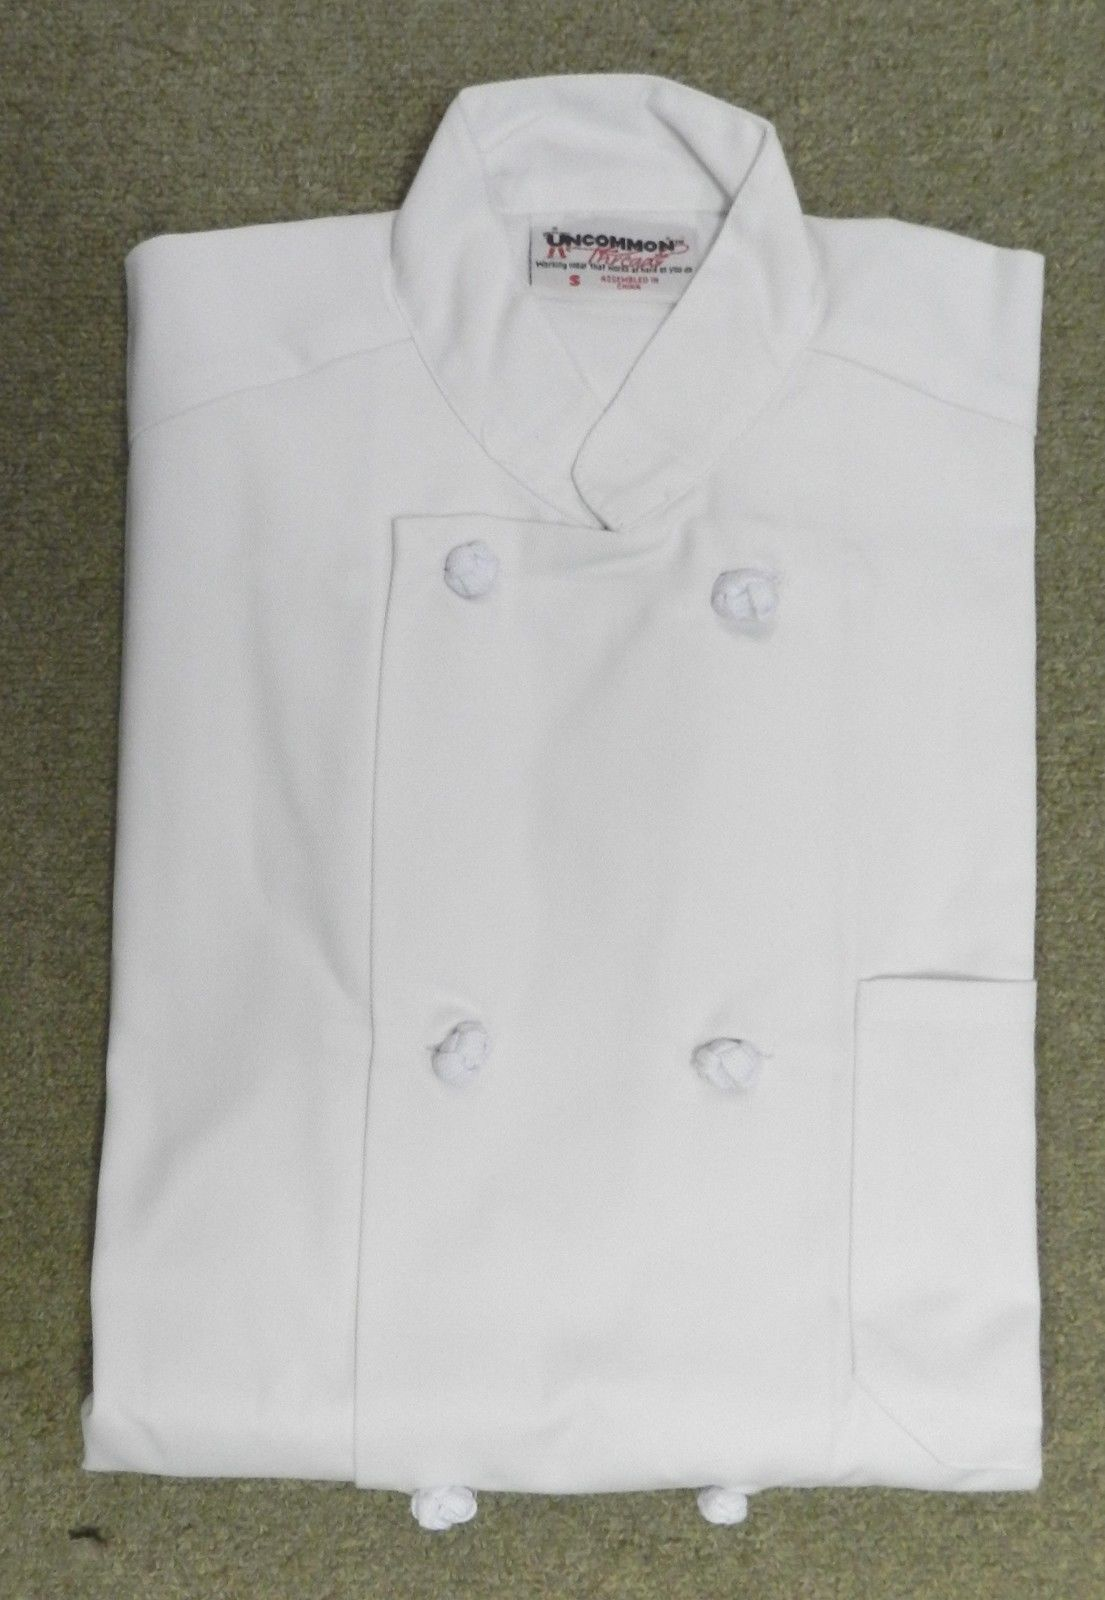 Chef Jacket White XL Uncommon Threads 403 Cloth Knot Button Uniform Coat New